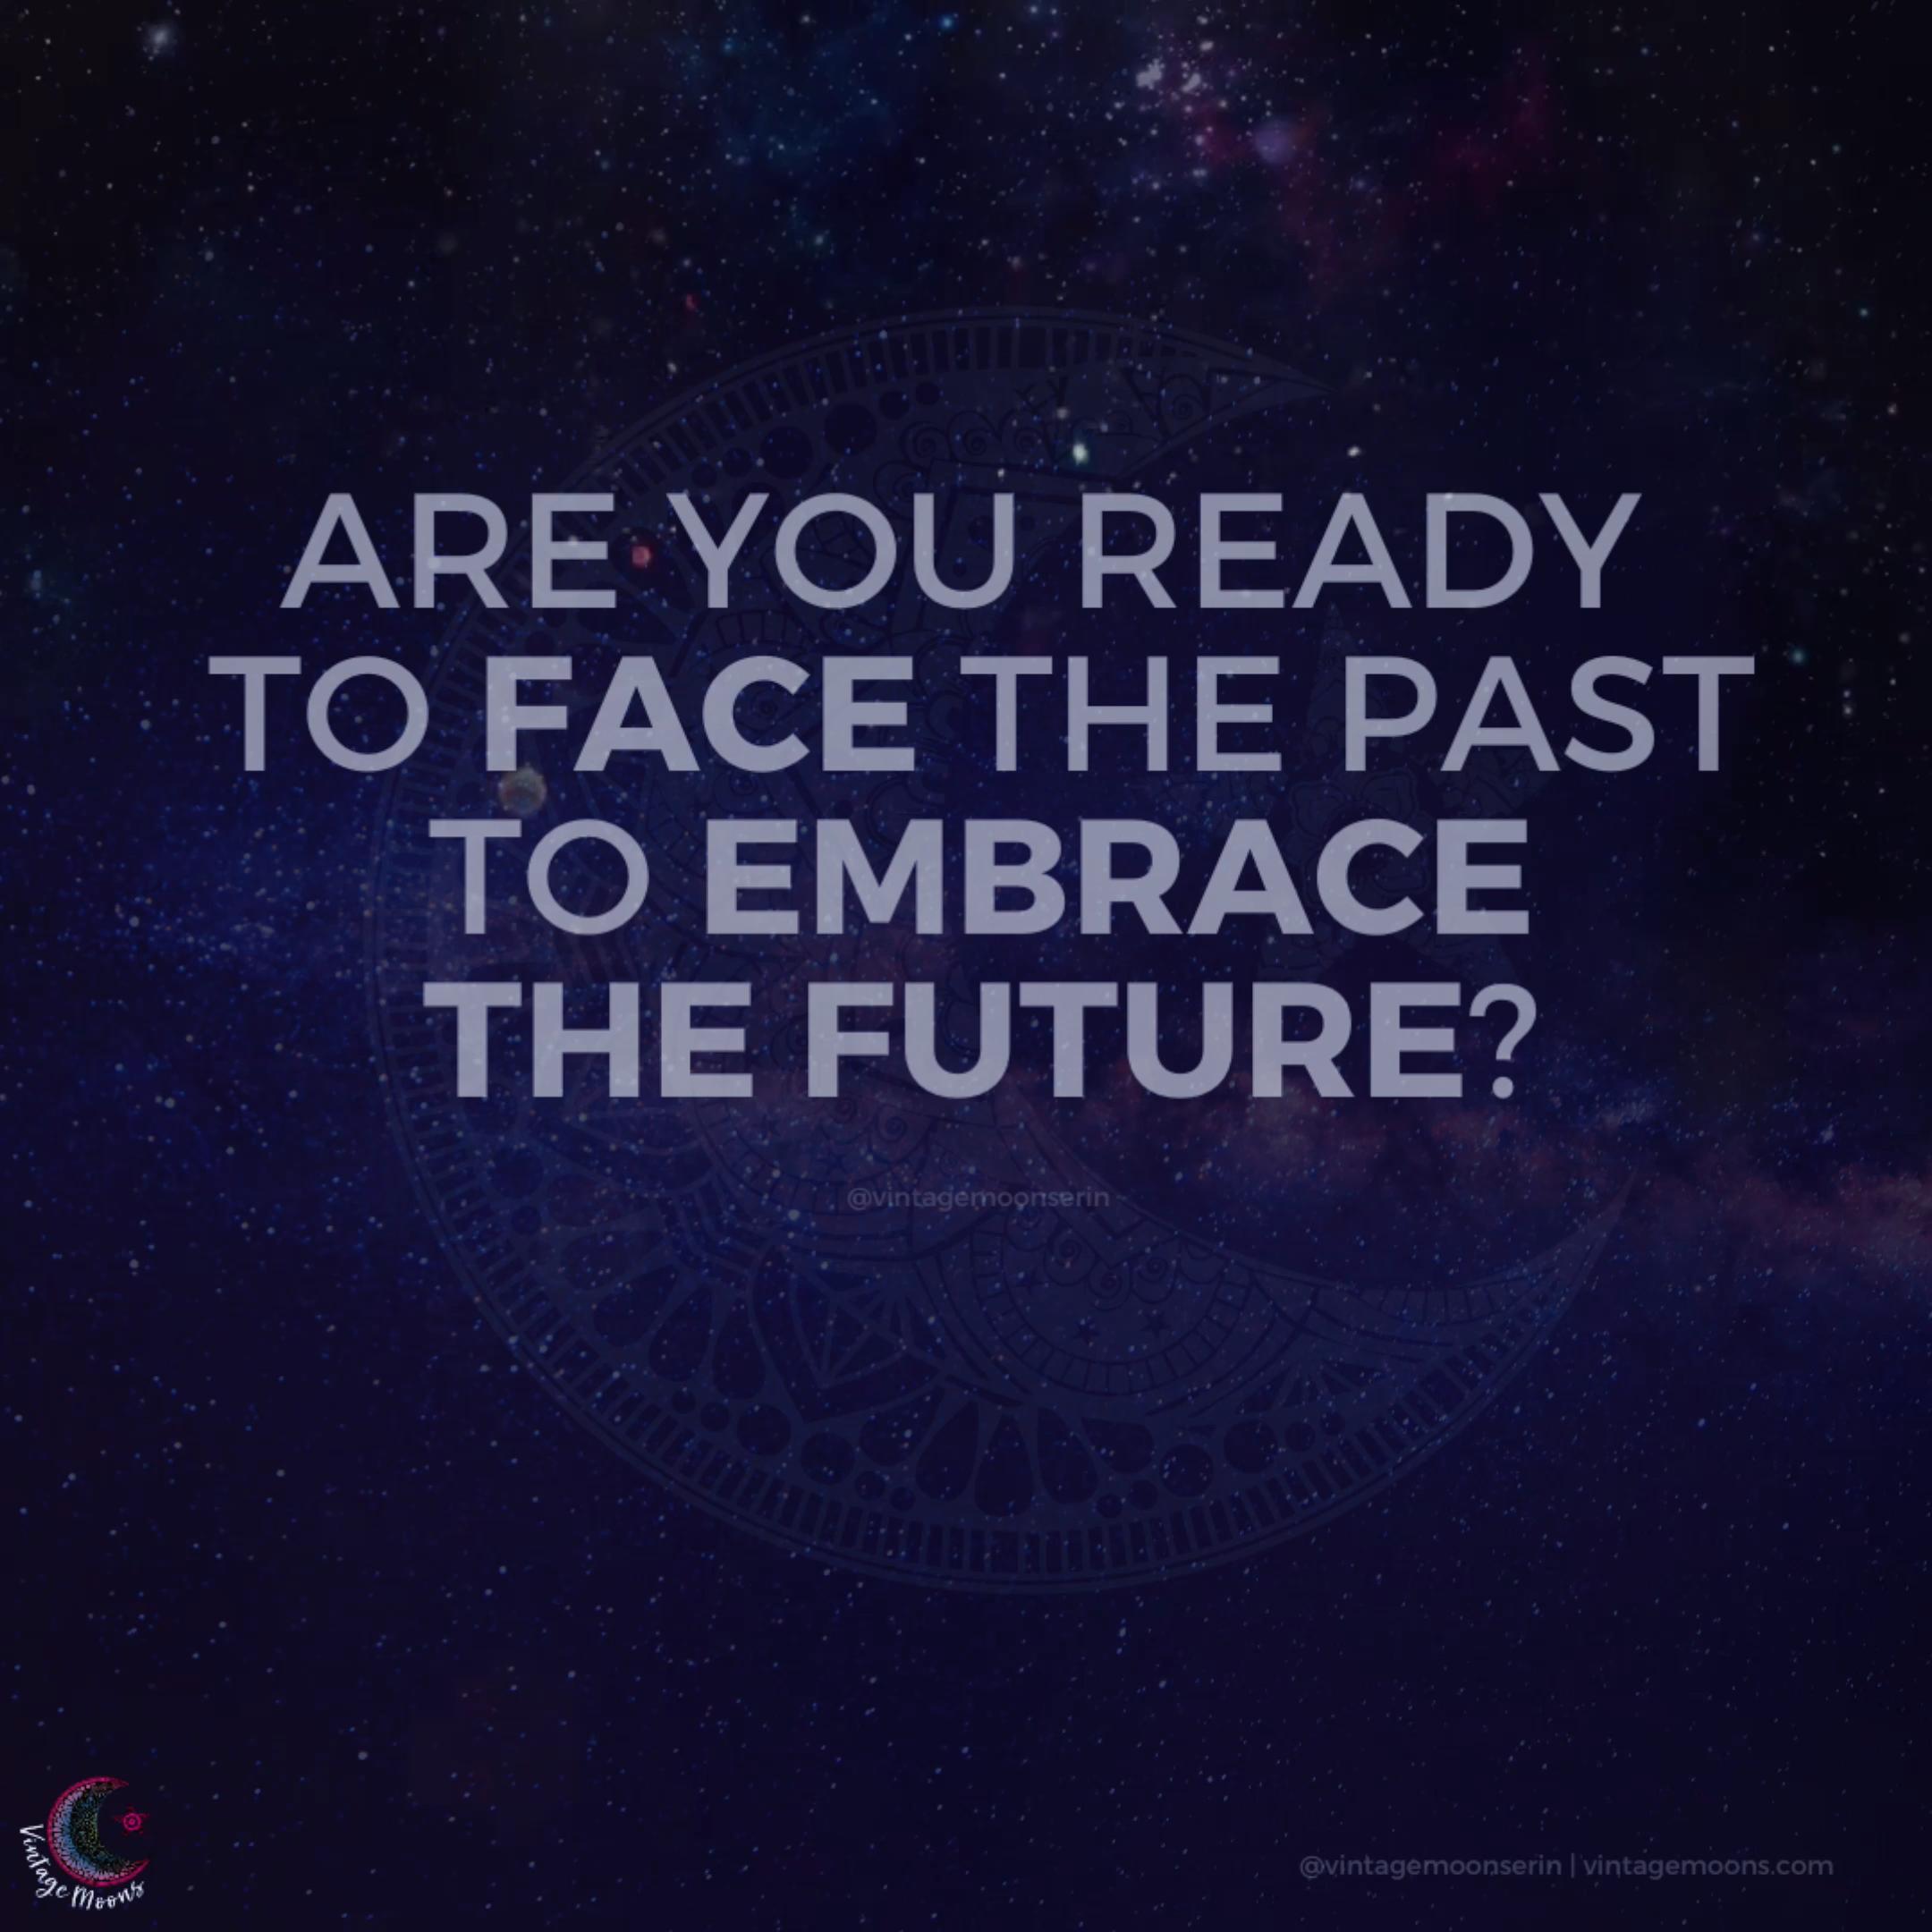 FACE PAST & EMBRACE FUTURE